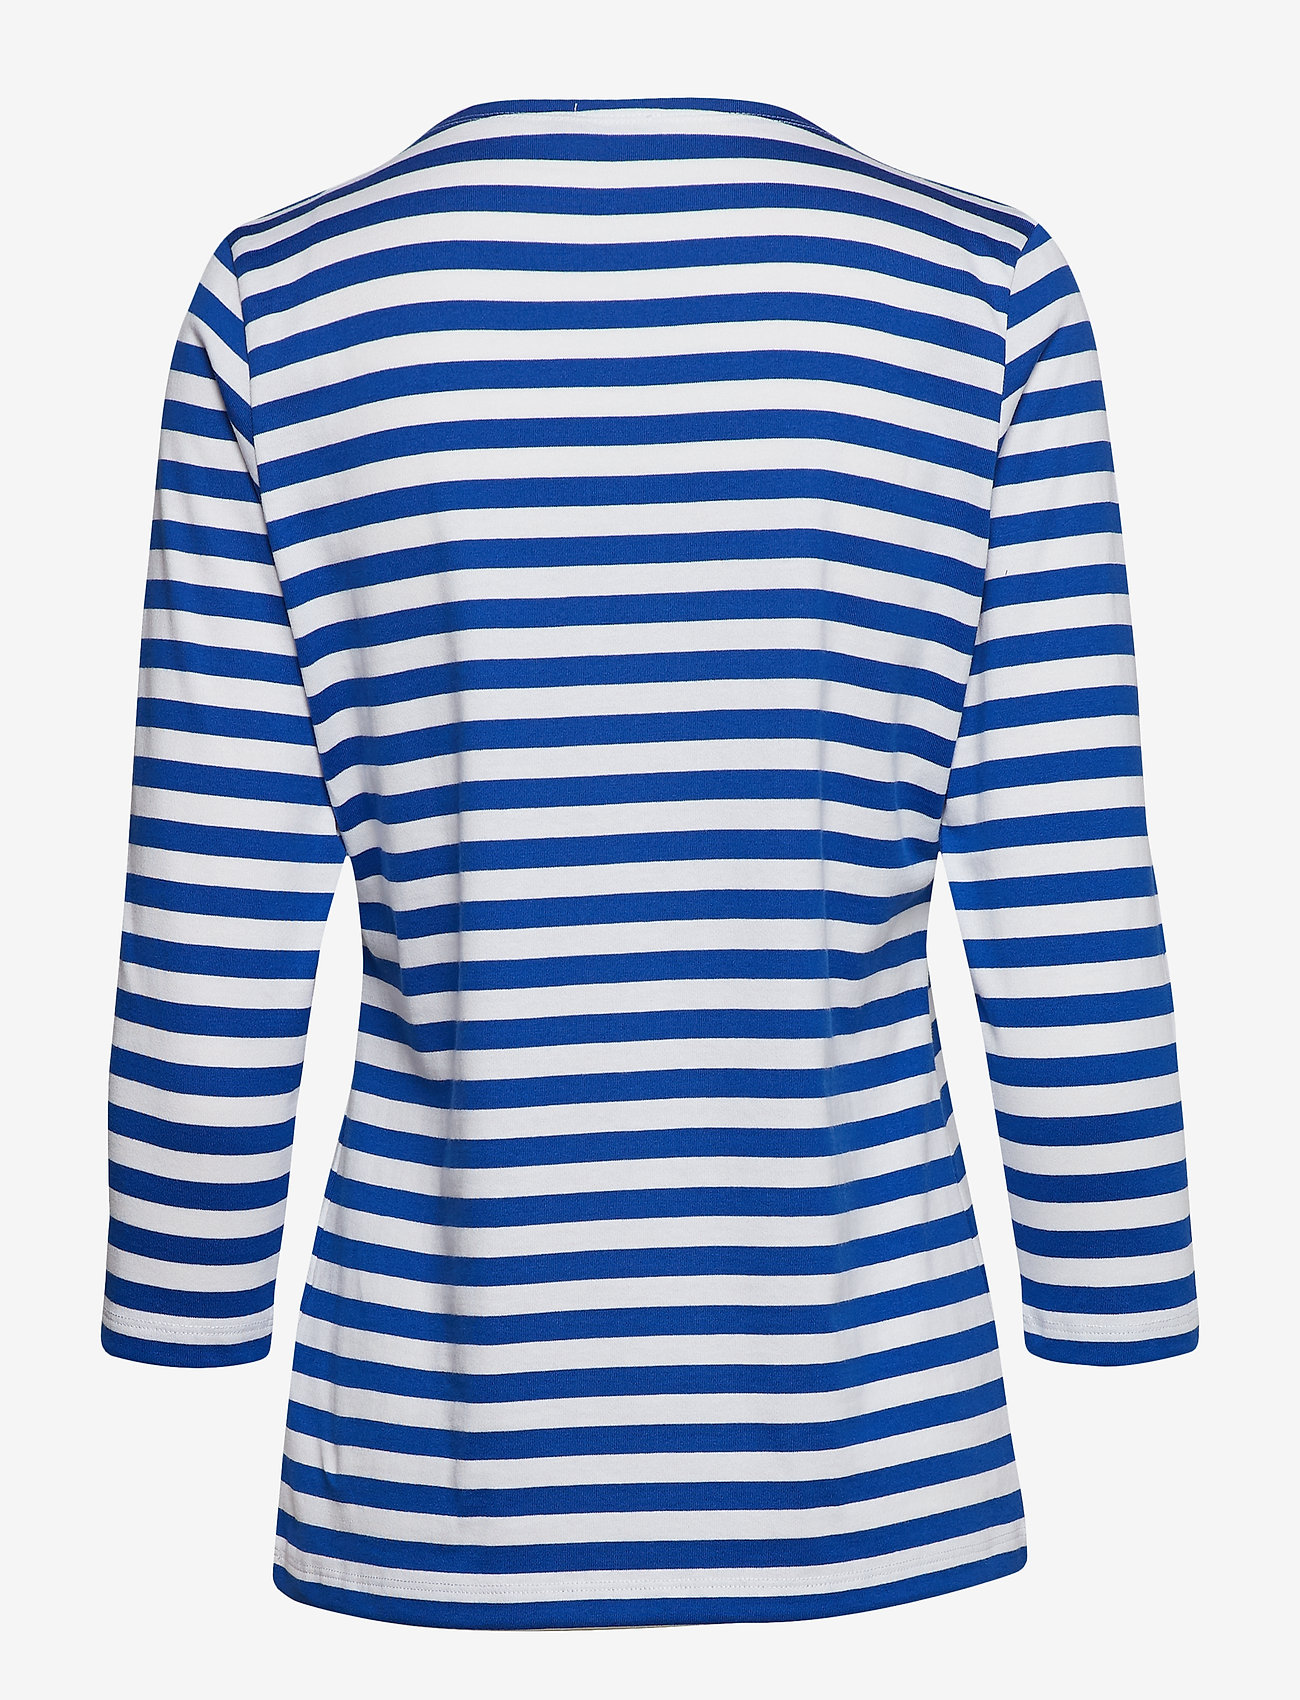 Marimekko - Ilma shirt - langærmede toppe - white, blue - 1